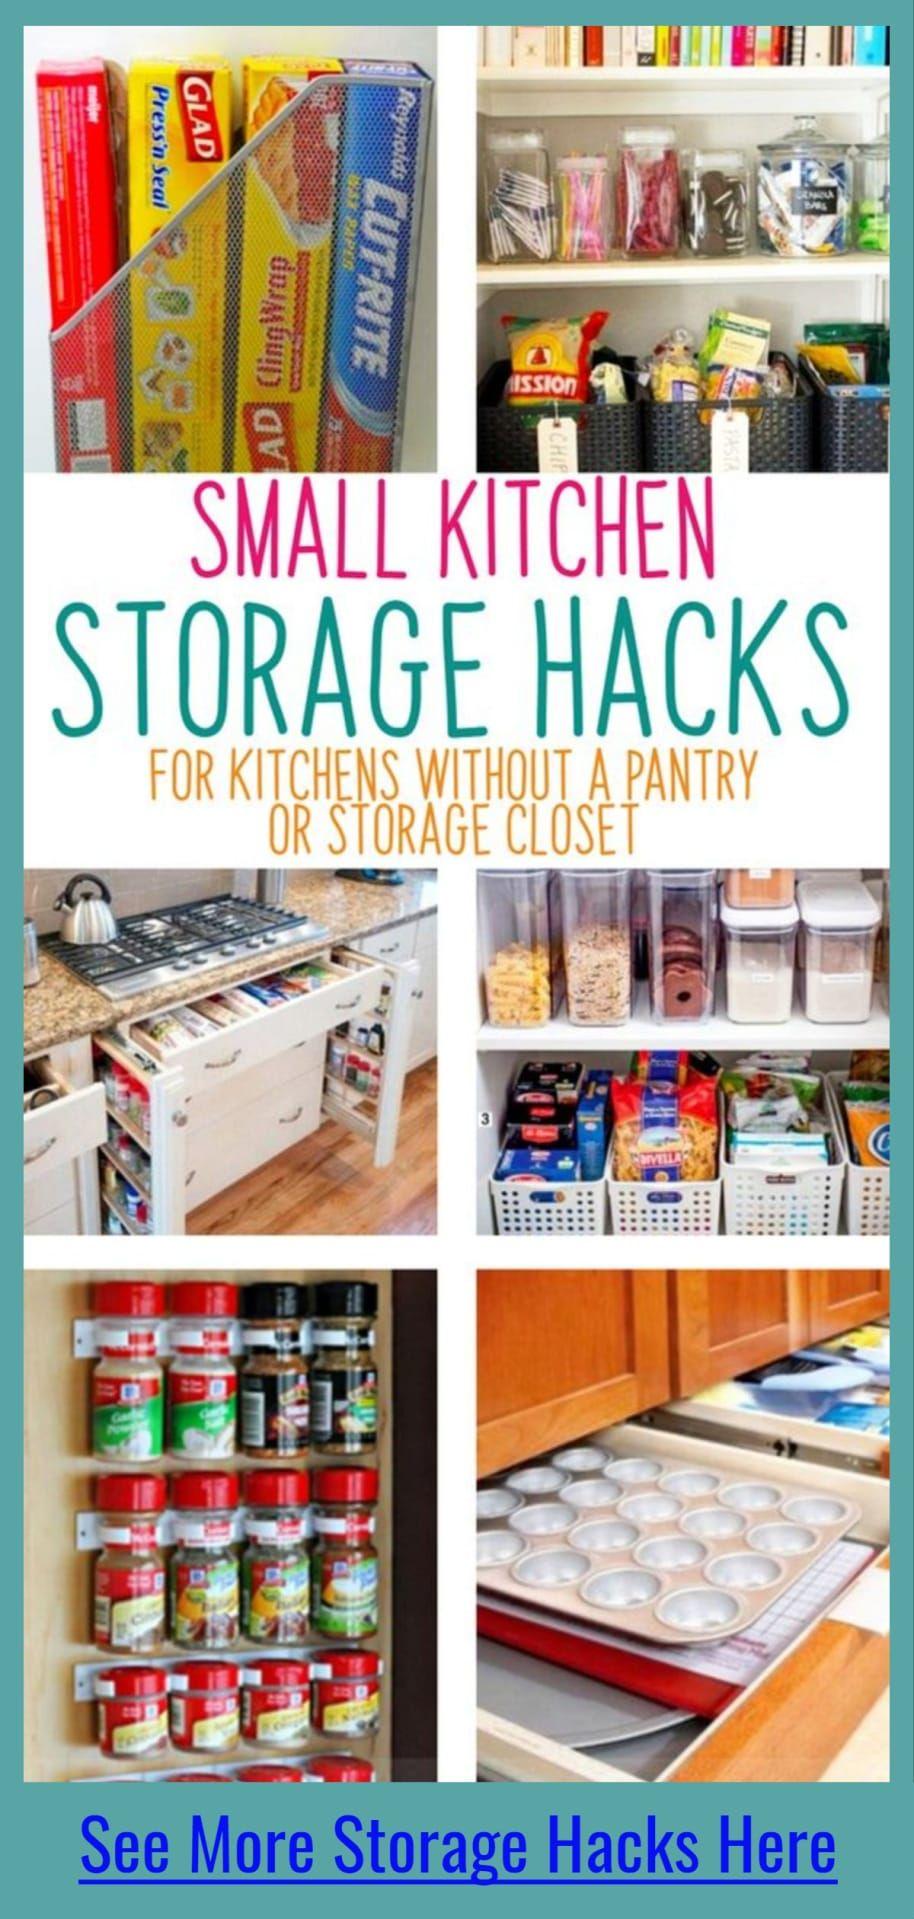 Small Apartment Kitchen Storage Ideas That Won T Risk Your Deposit